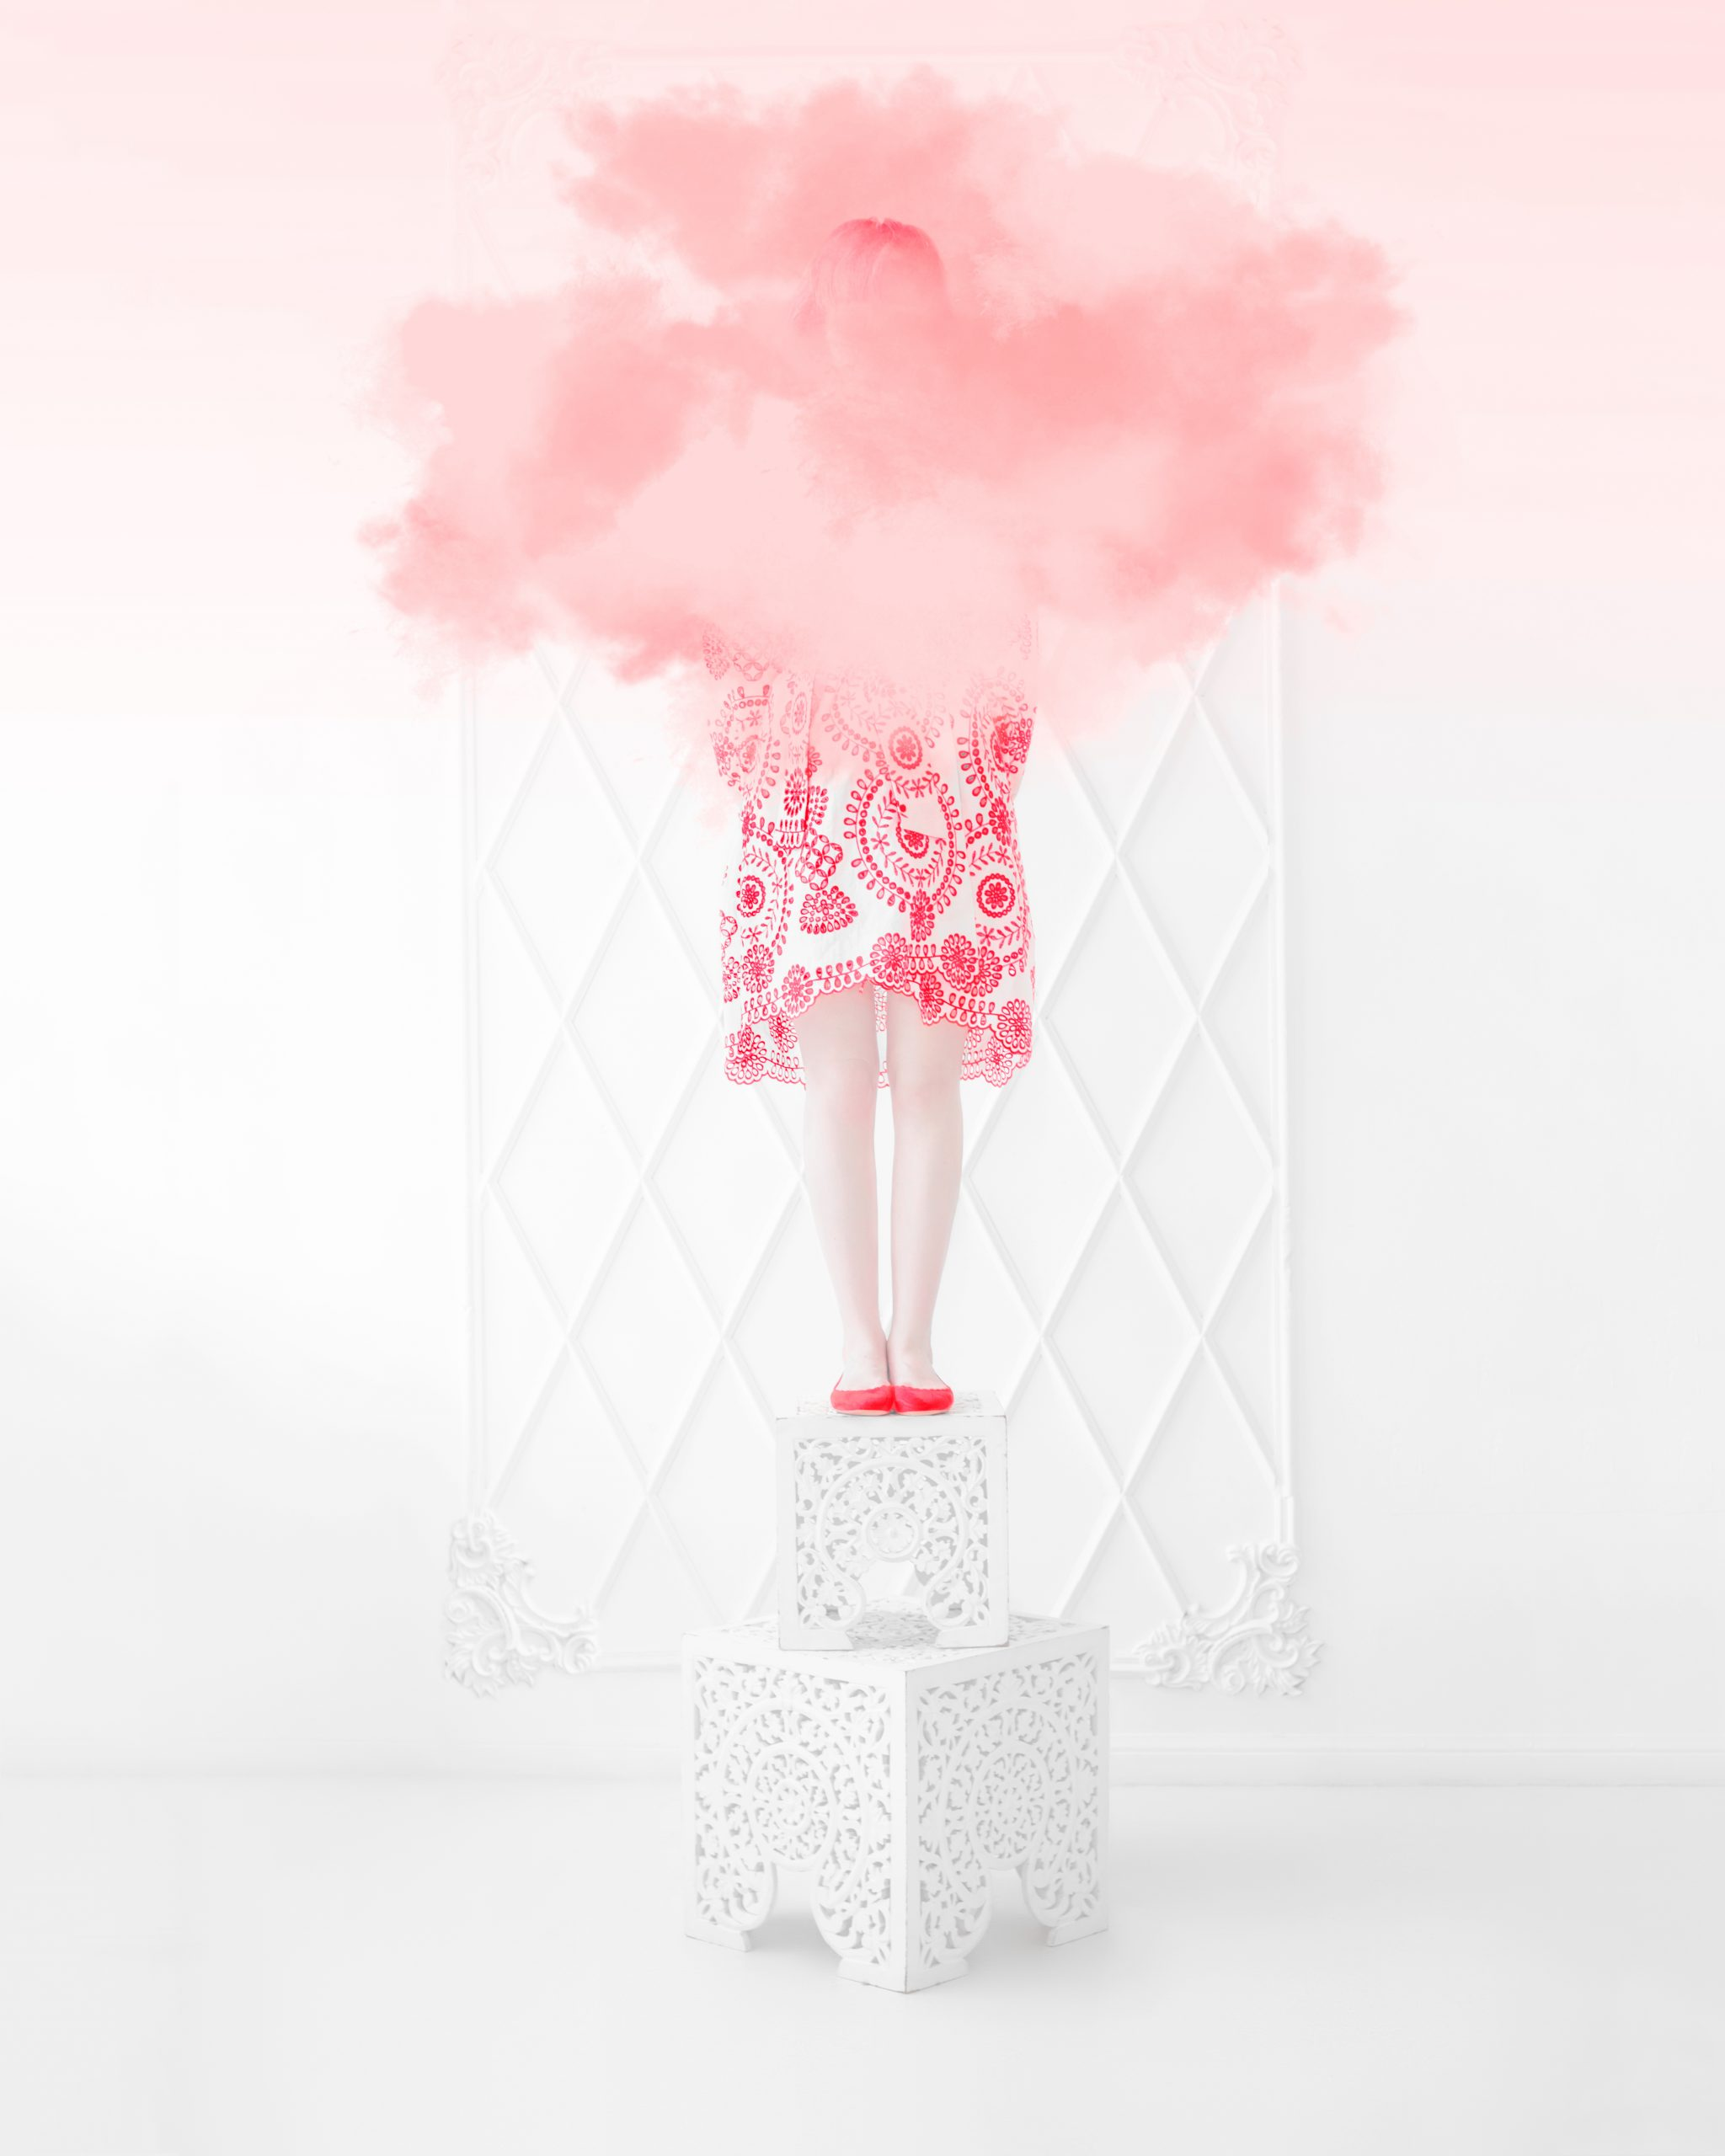 Renat Renee-Ell , Day Dreaming, 2019